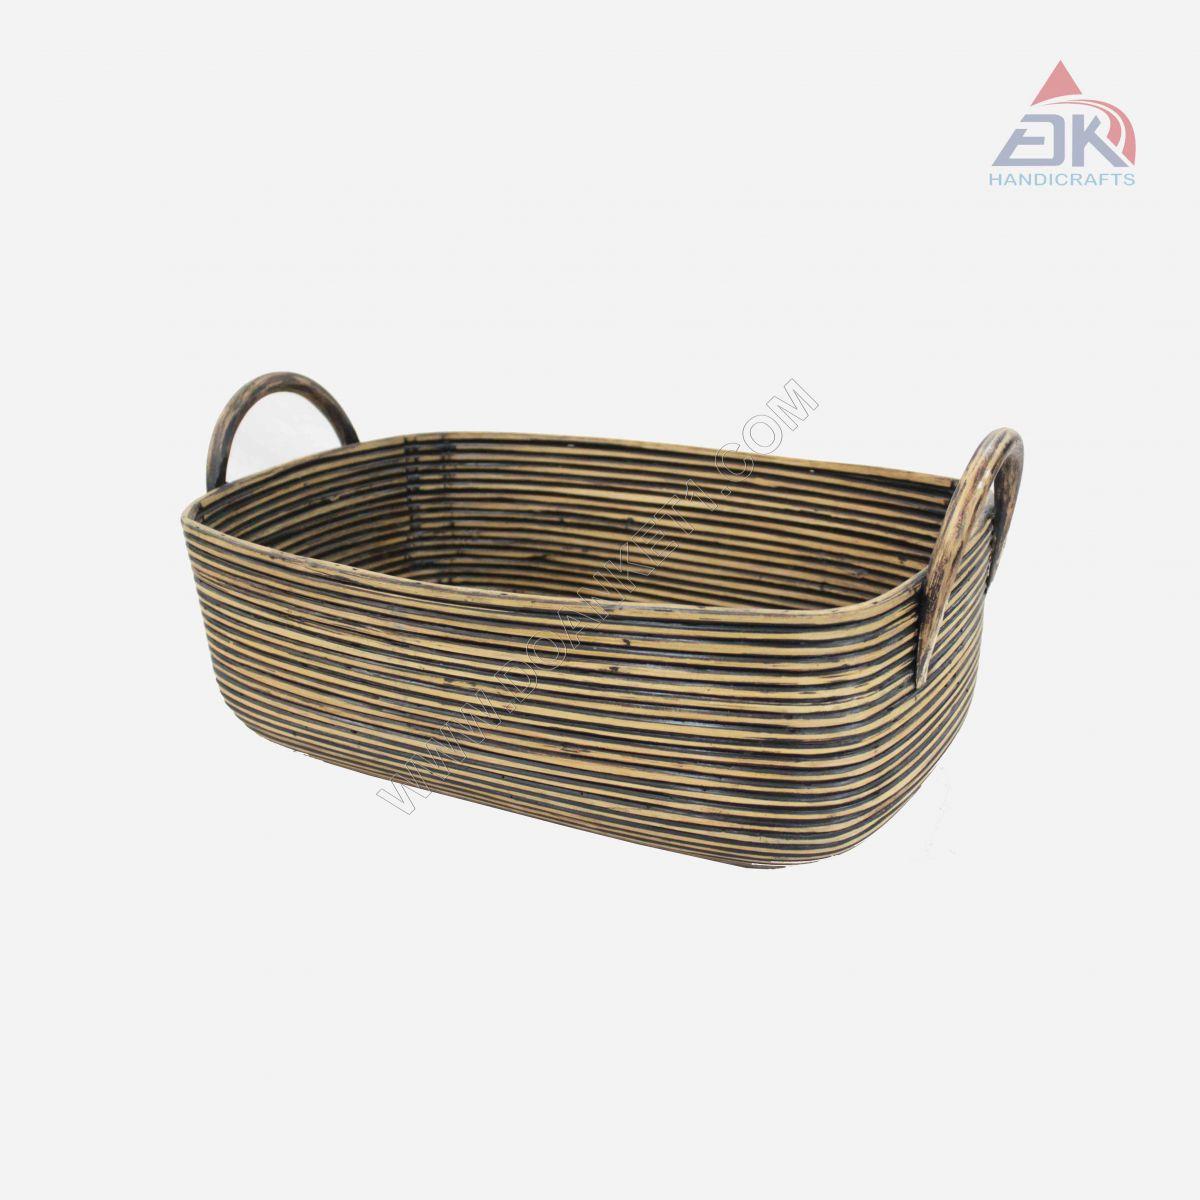 Rattan Basket # DK44